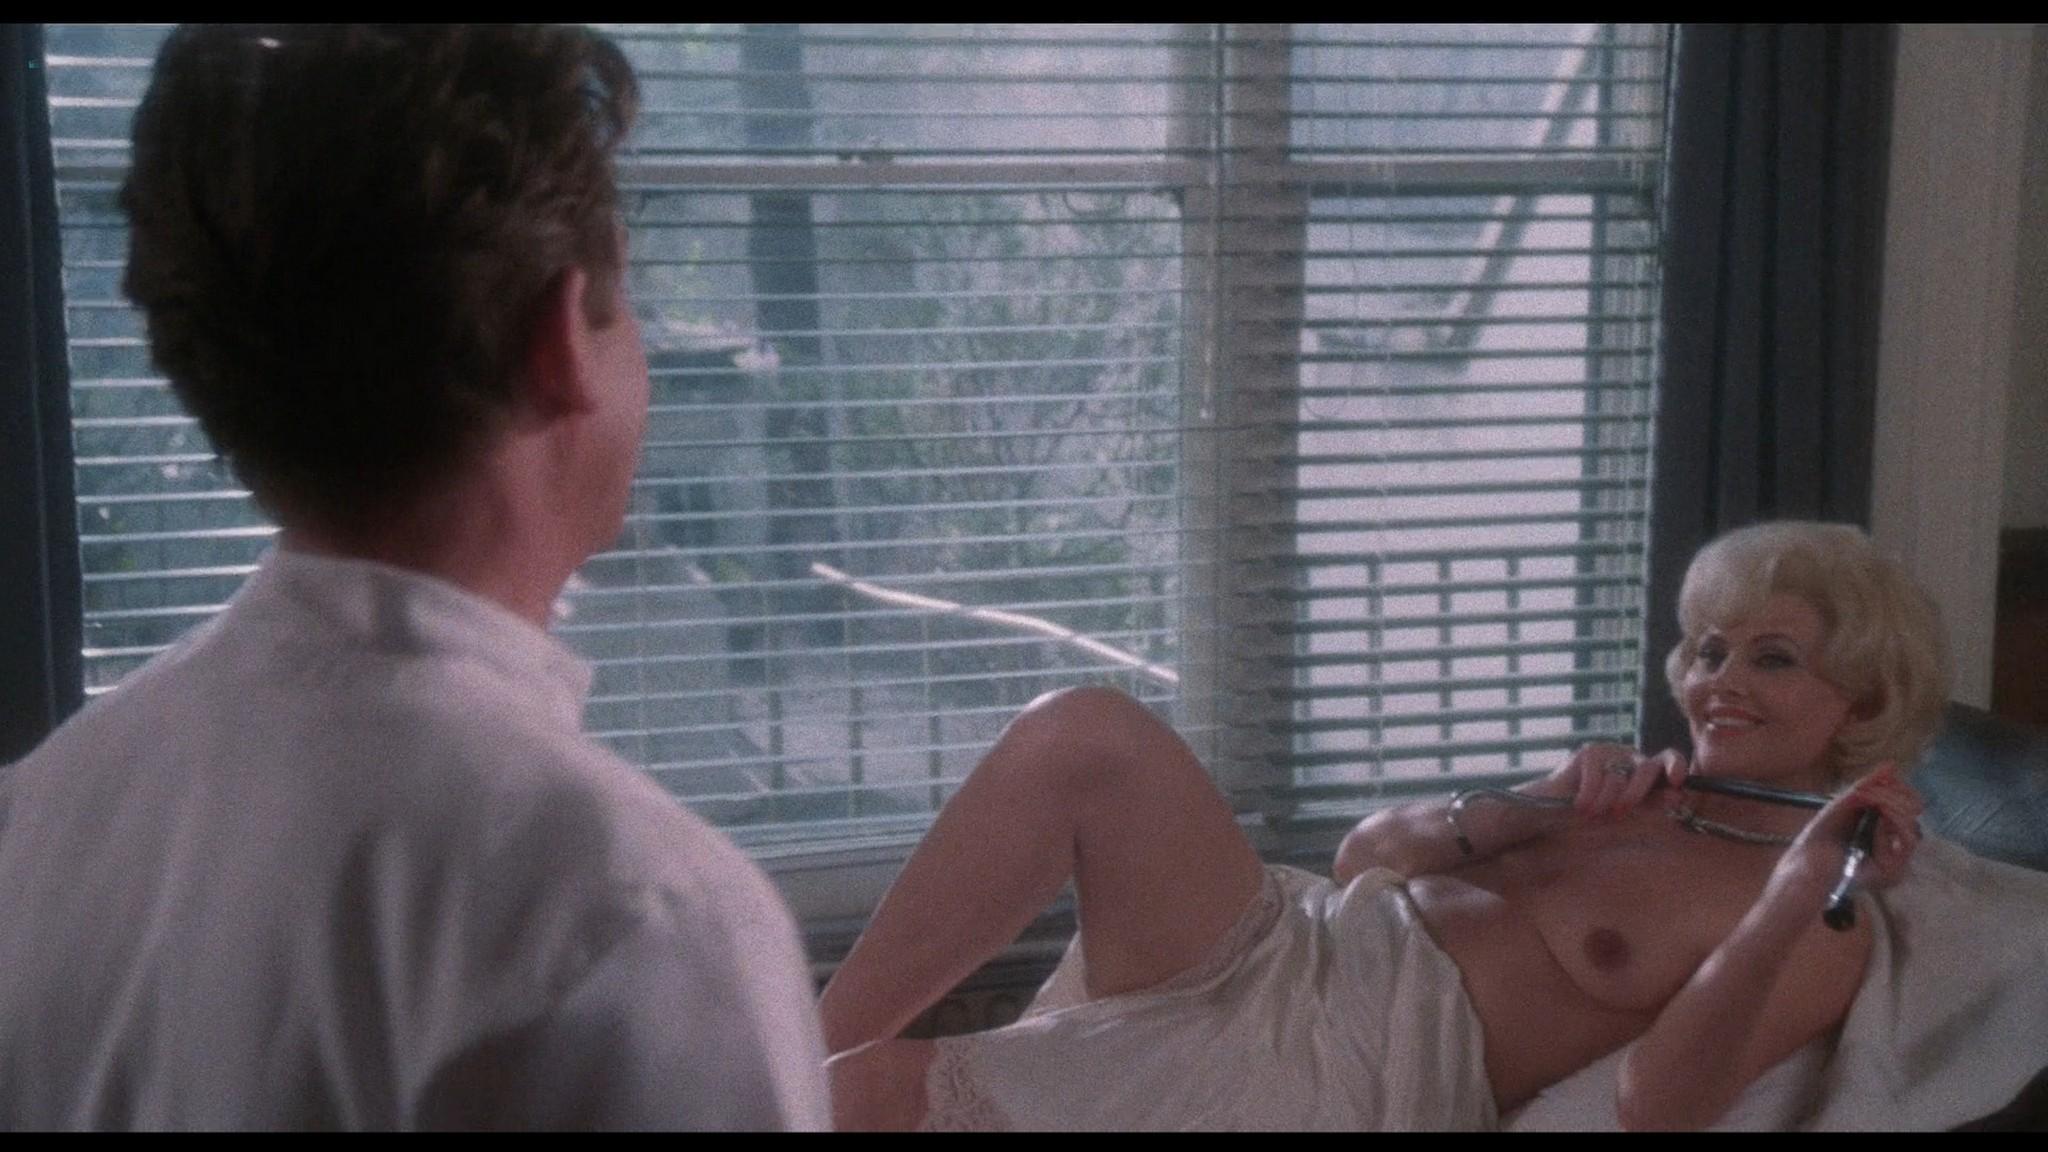 Bridget Fonda nude butt boobs Britt Ekland nude Joanne Whalley hot - Scandal (1989) HD 1080p BluRay (10)